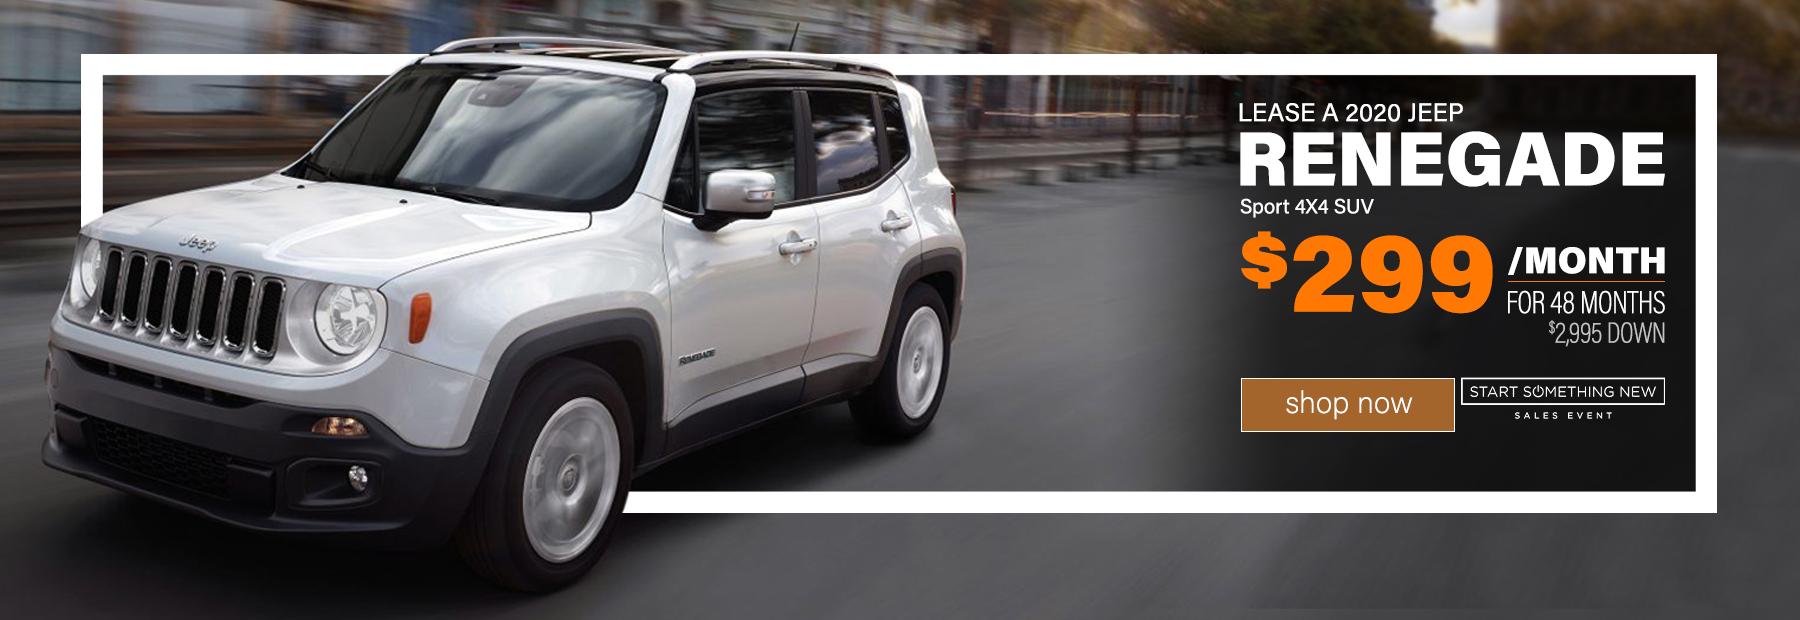 new-2020-jeep-renegade-lease-deal-dayton-ohio